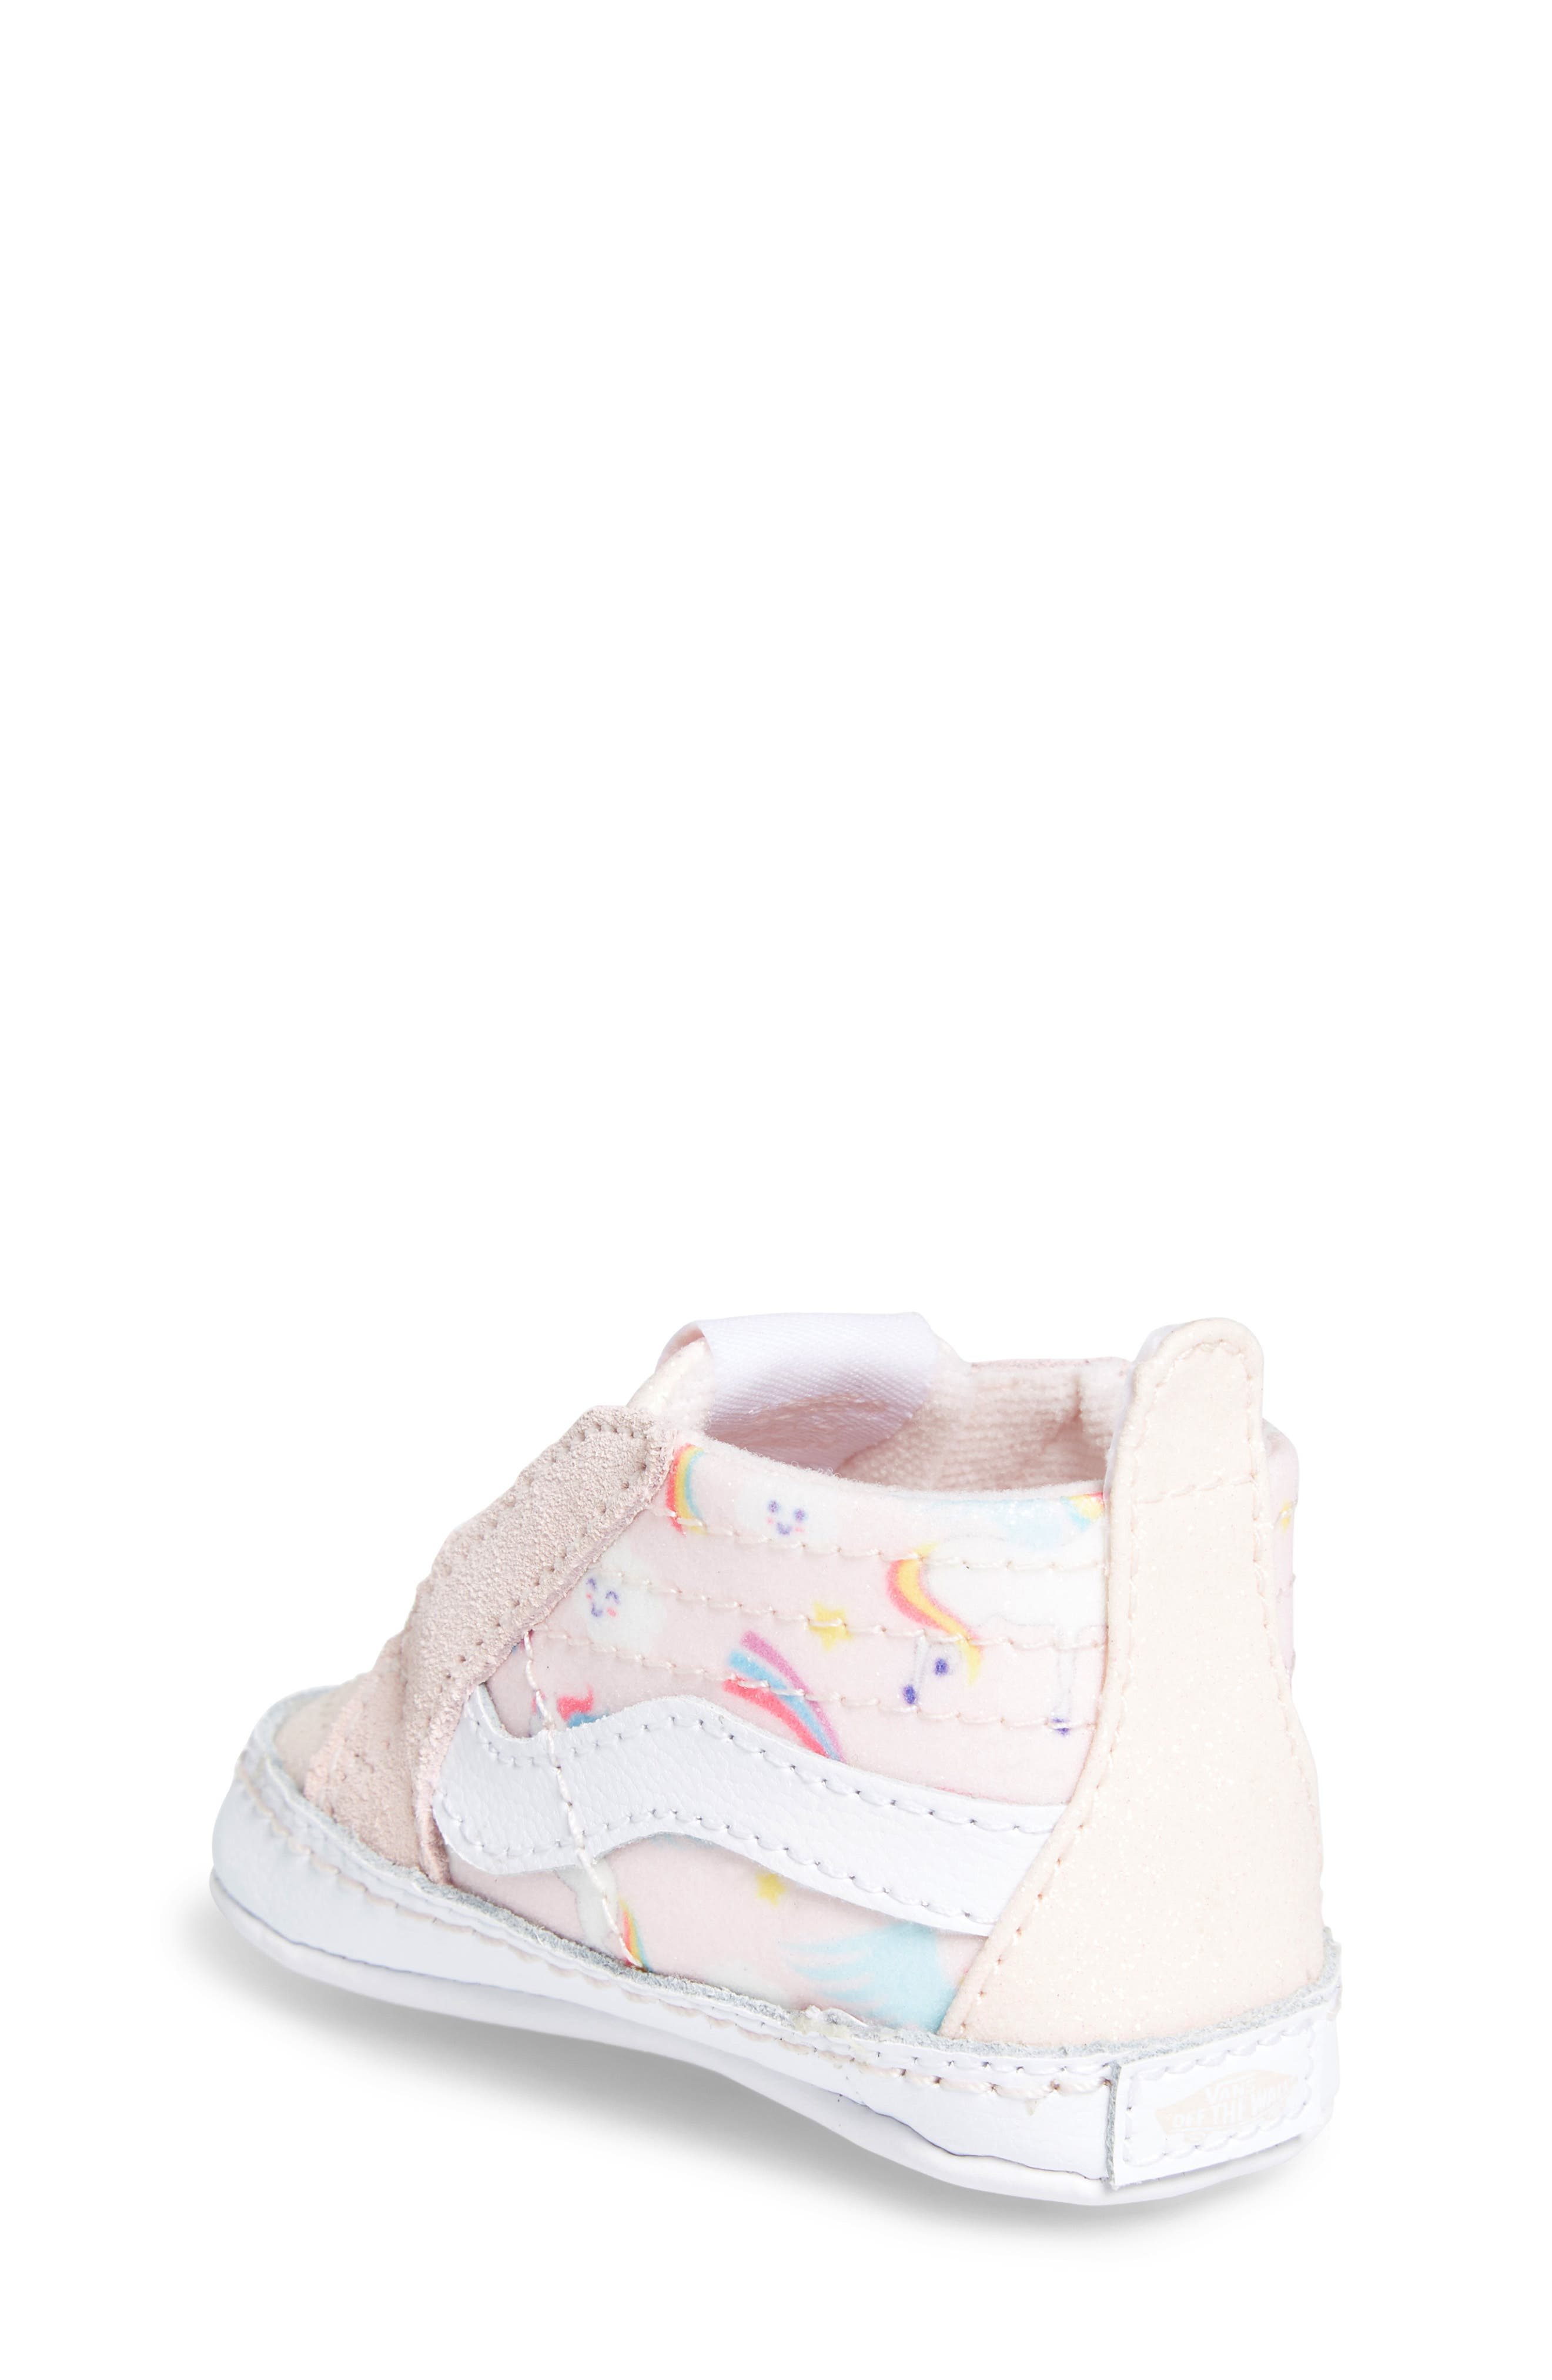 'SK8-Hi' Crib Sneaker,                             Alternate thumbnail 2, color,                             GLITTER PEGASUS PINK/ WHITE